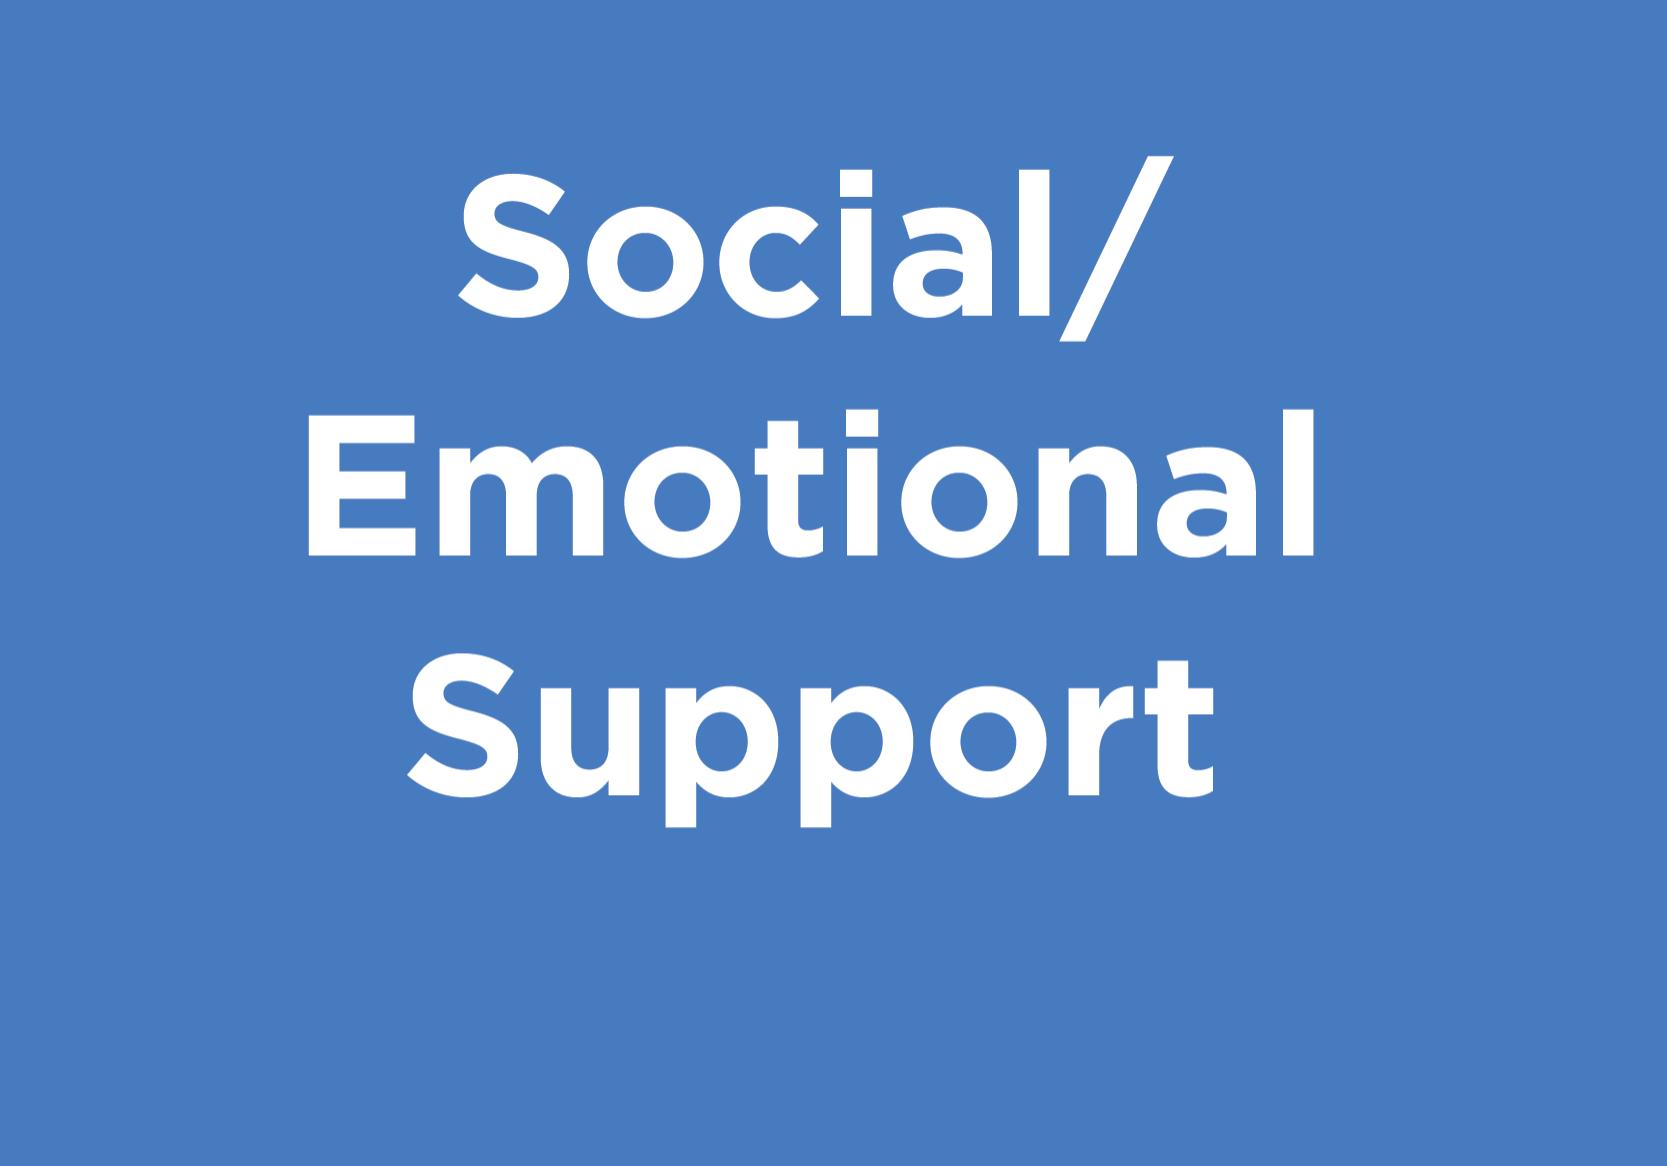 Social/Emotional Support